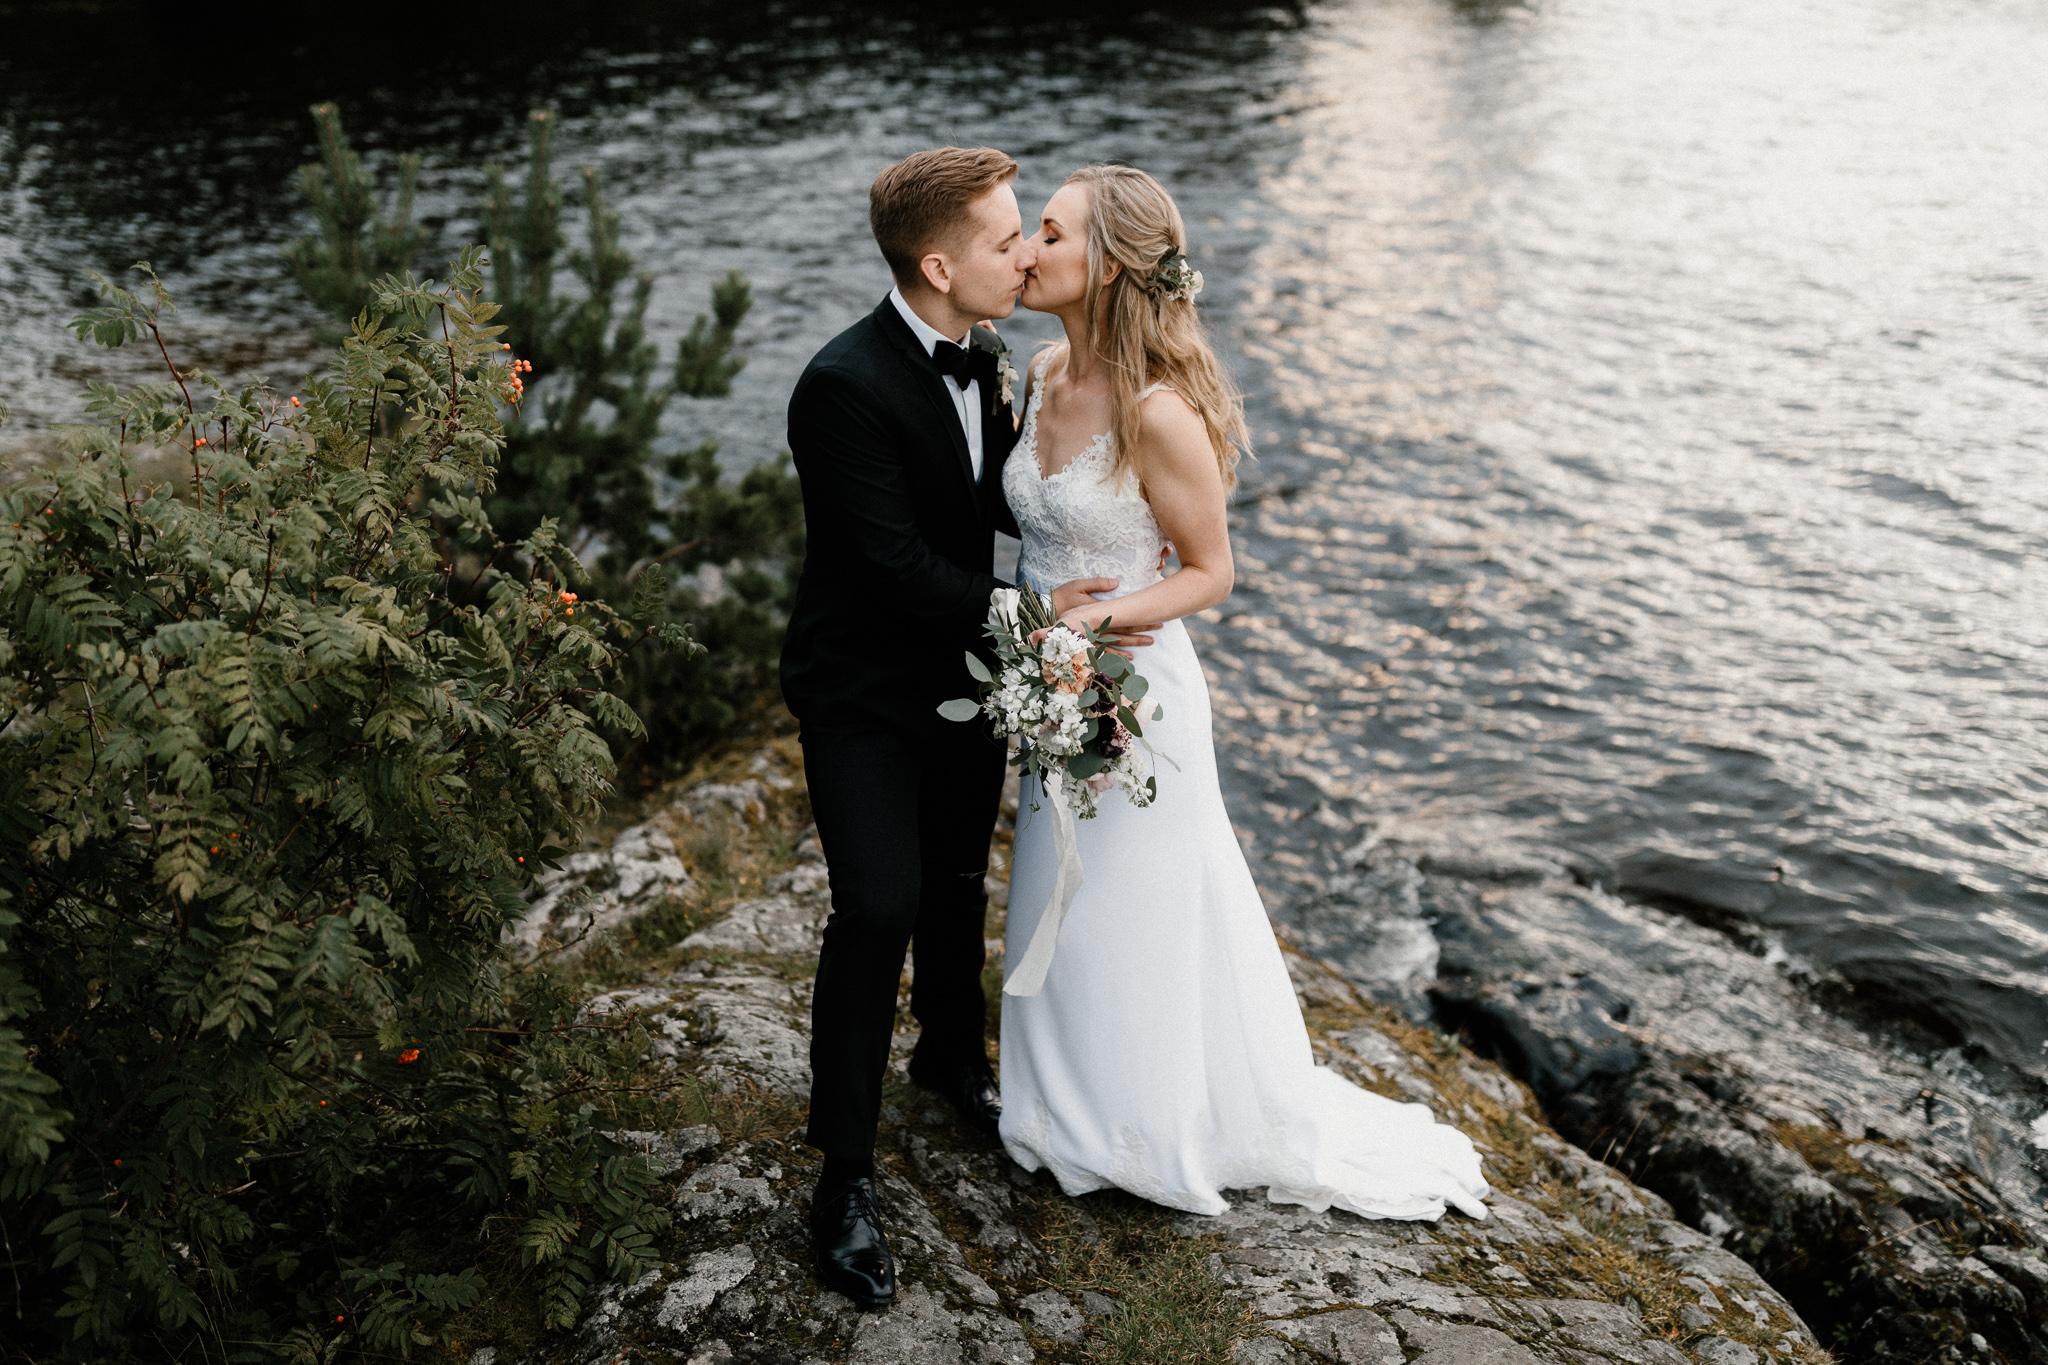 Johanna + Mikko - Tampere - Photo by Patrick Karkkolainen Wedding Photographer-123.jpg